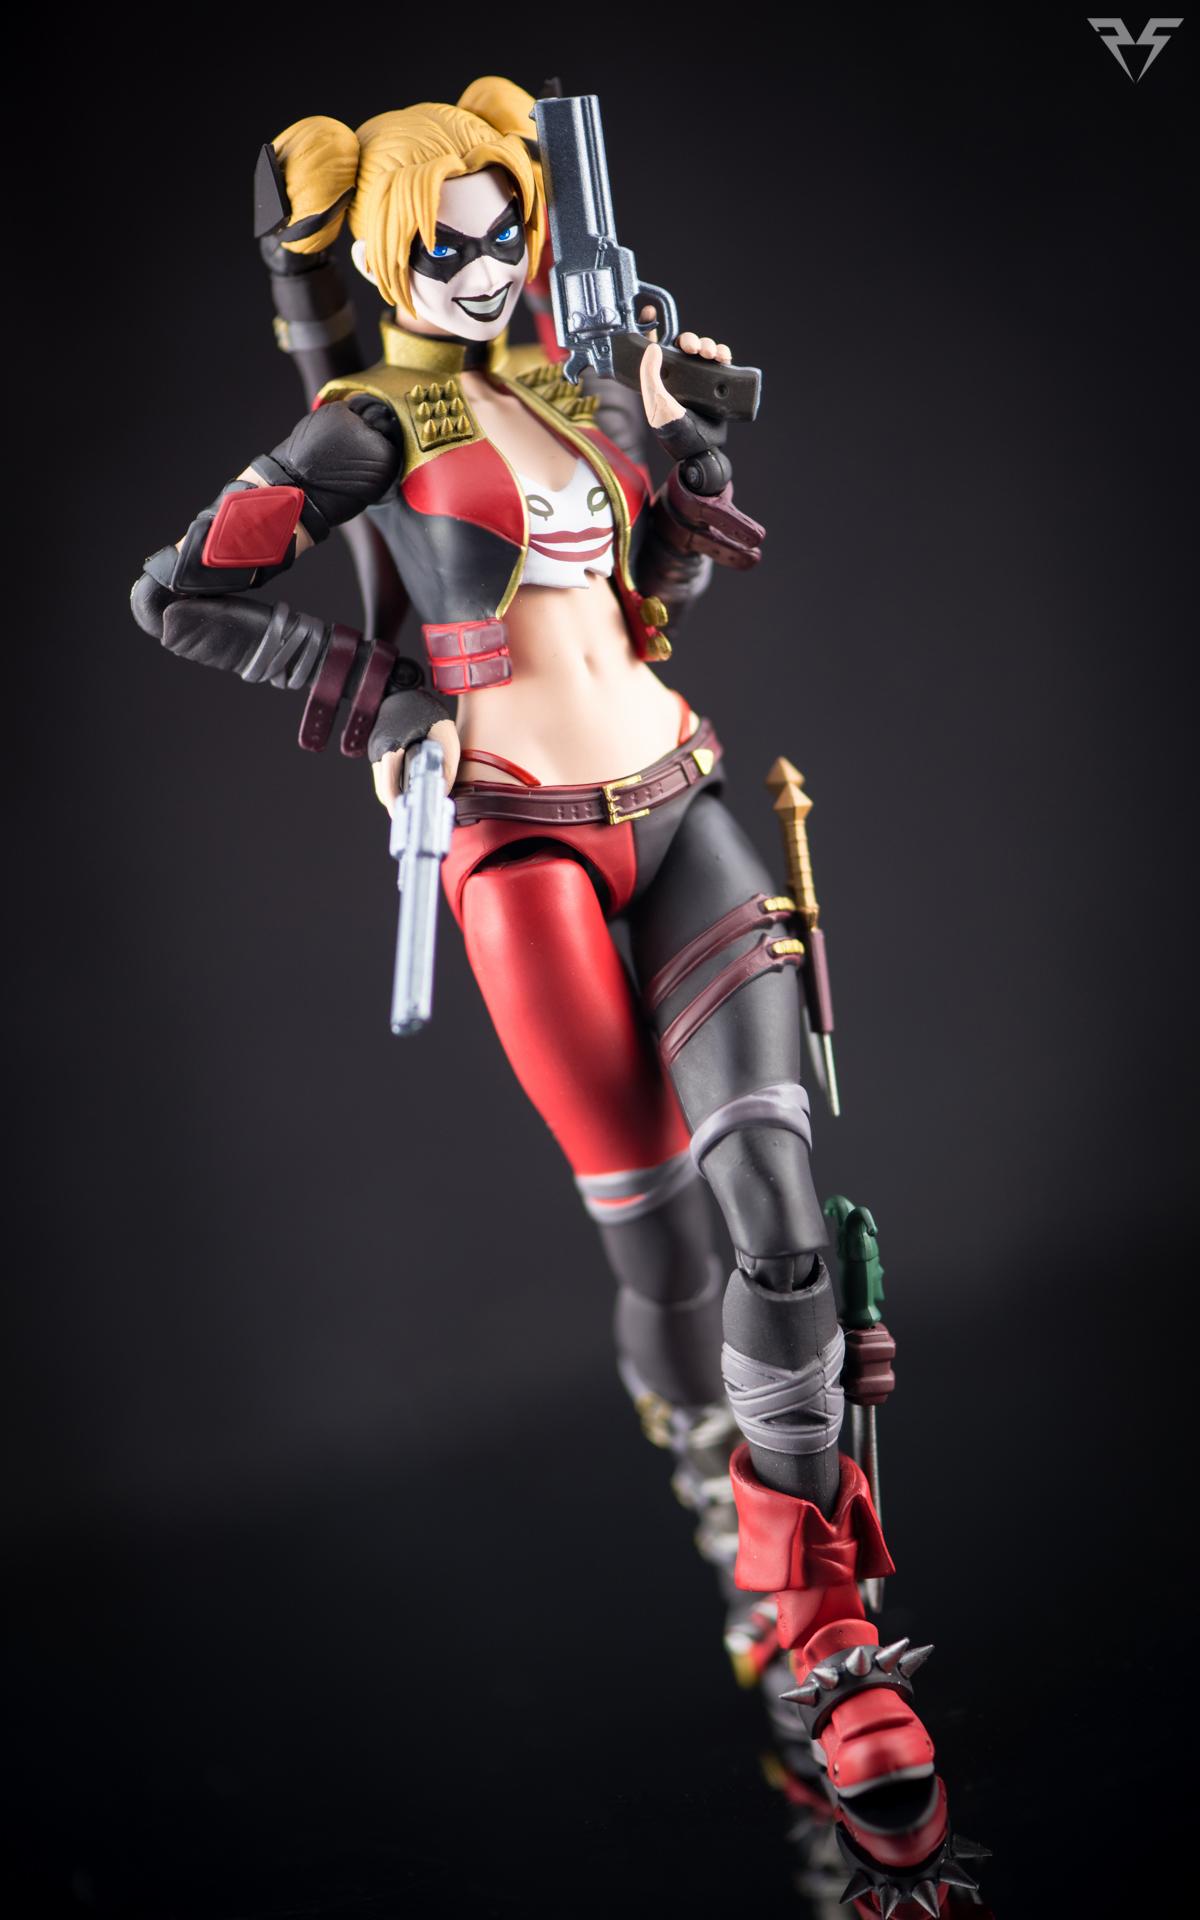 Figuarts Harley Quinn-3.jpg